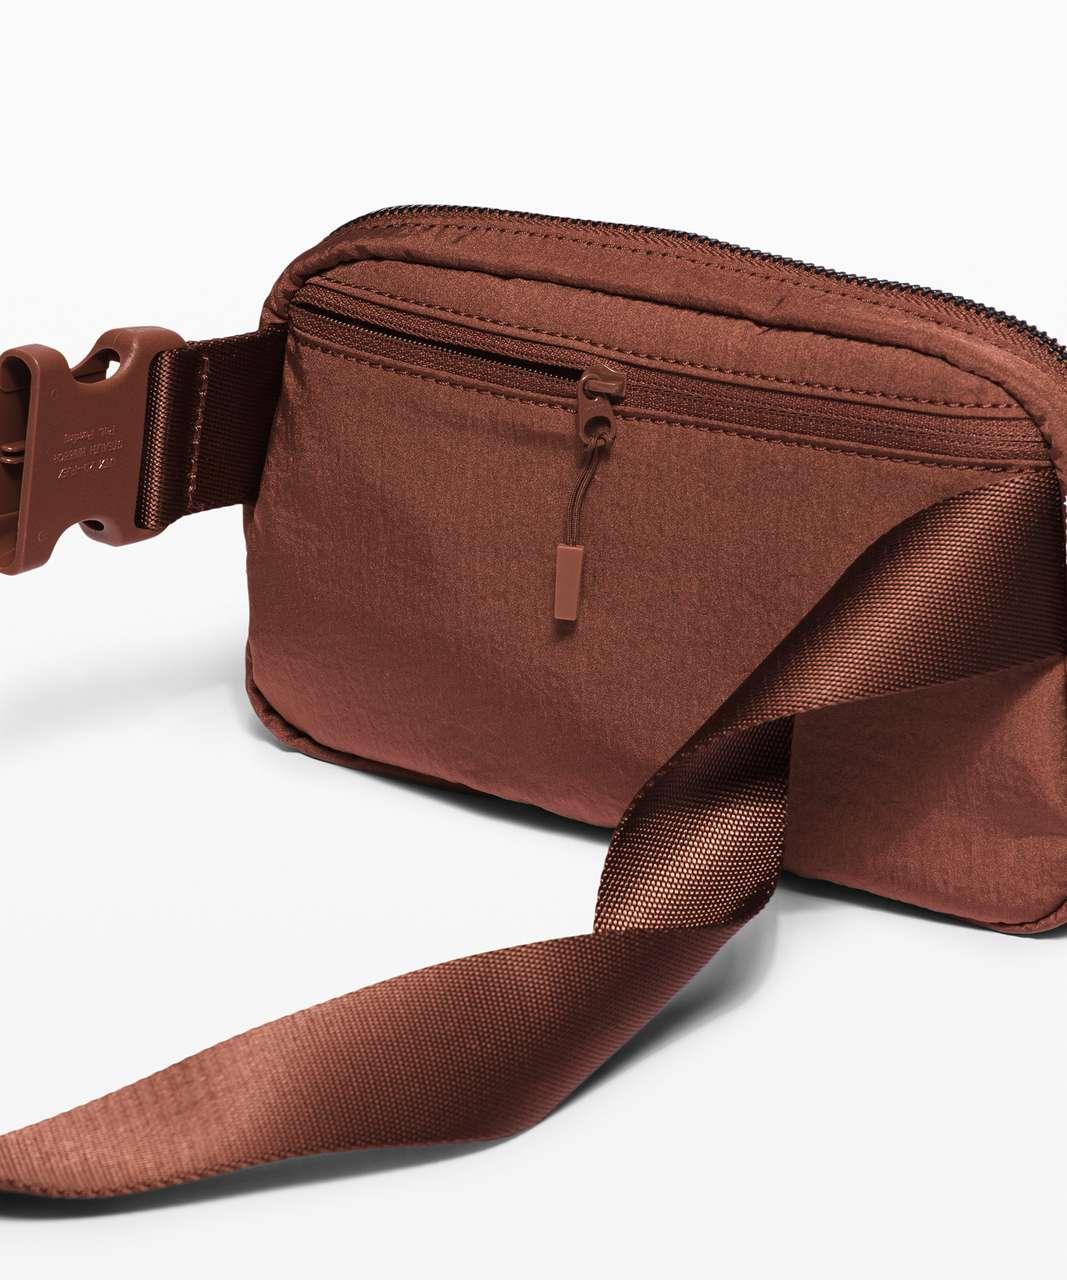 Lululemon Everywhere Belt Bag *1L - Ancient Copper